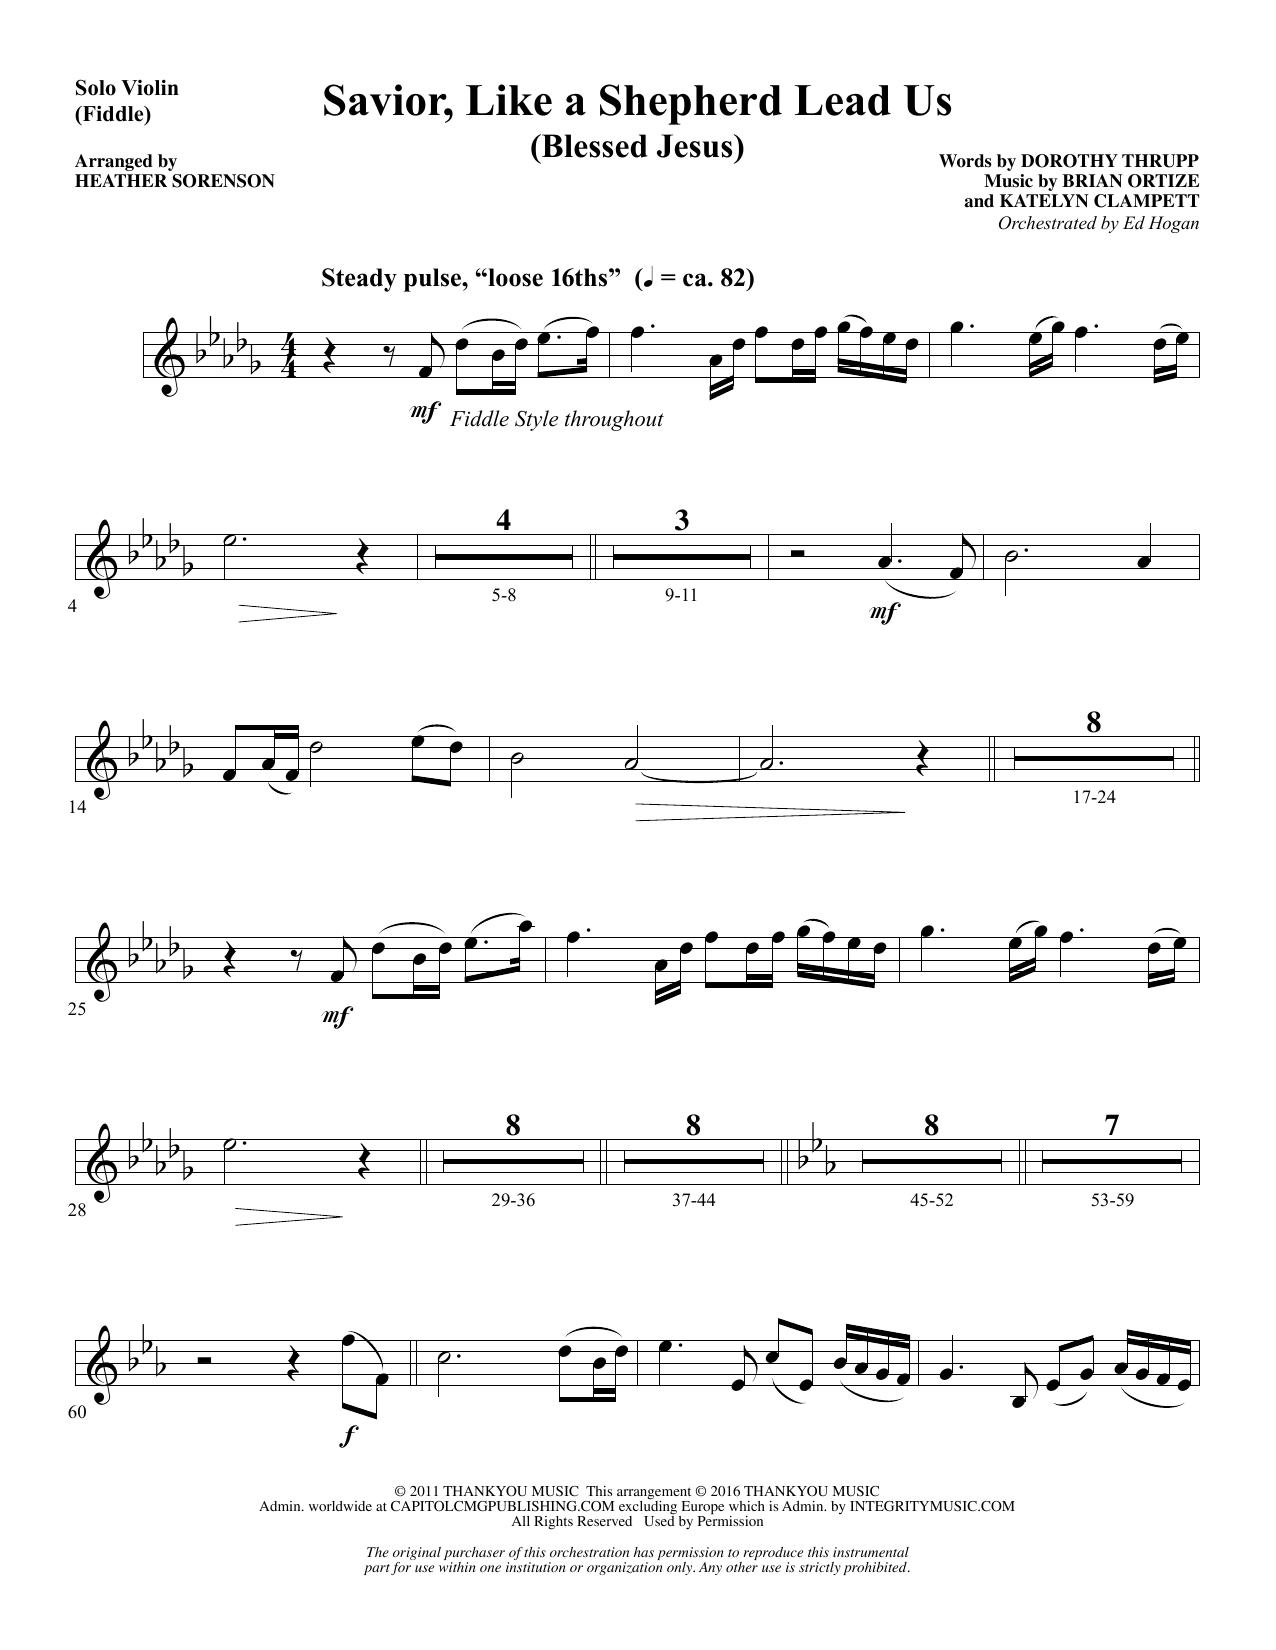 Katelyn Clampett - Savior, Like a Shepherd Lead Us (Blessed Jesus) - Fiddle/Violin